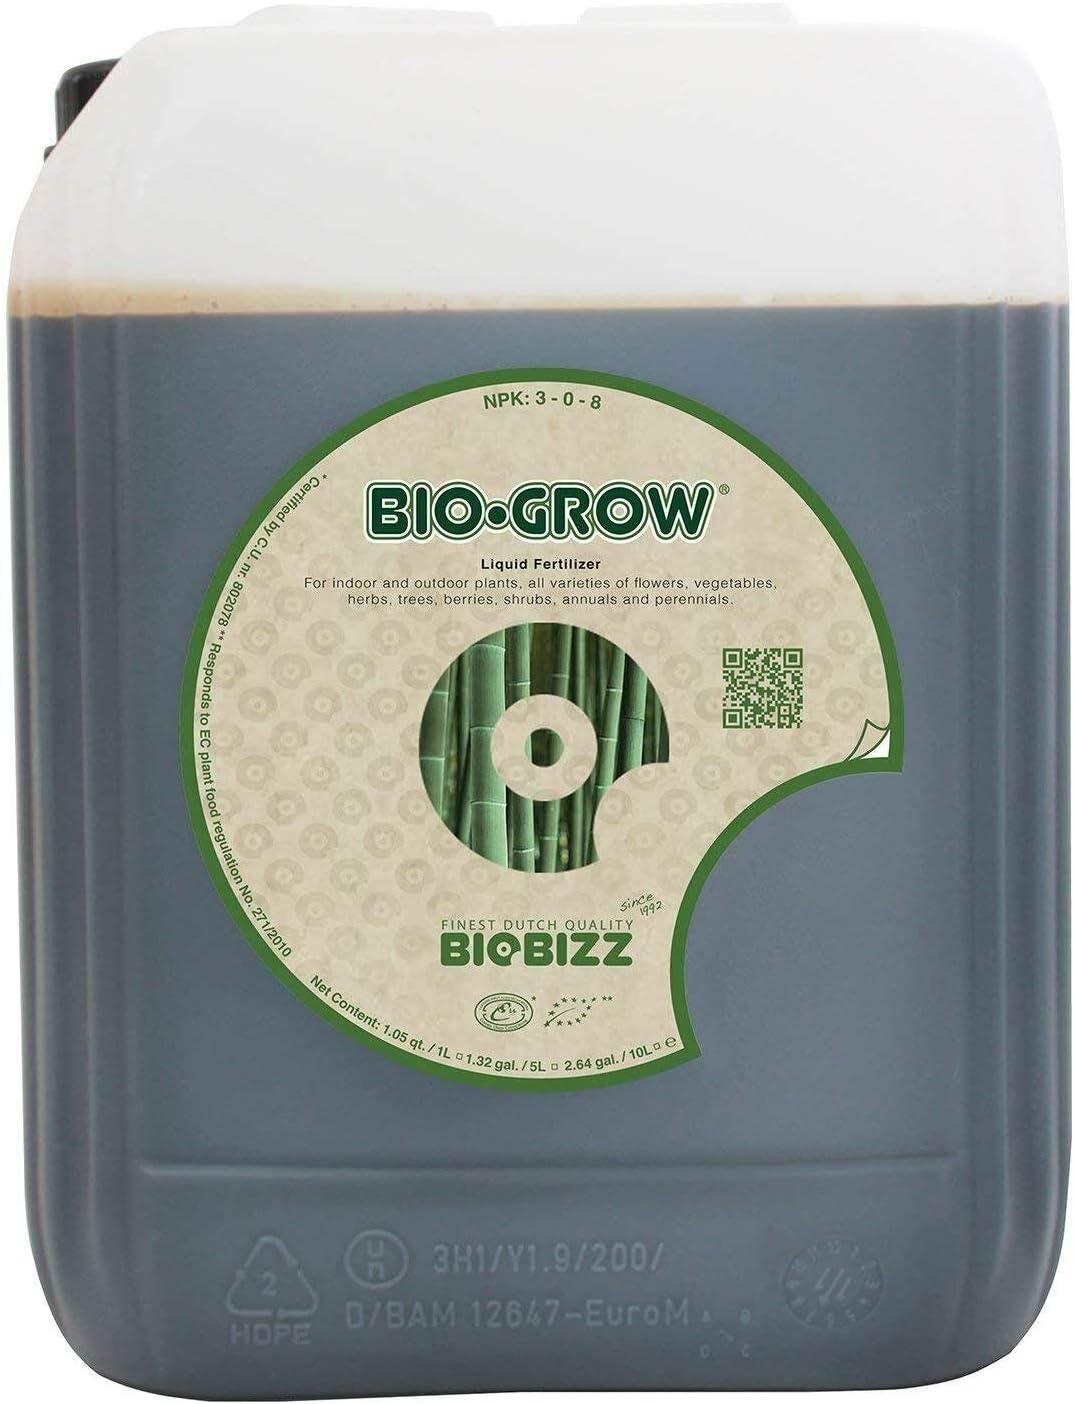 BioBizz 1 Bio-Grow 20 Liter Liquid Organic Plant Food